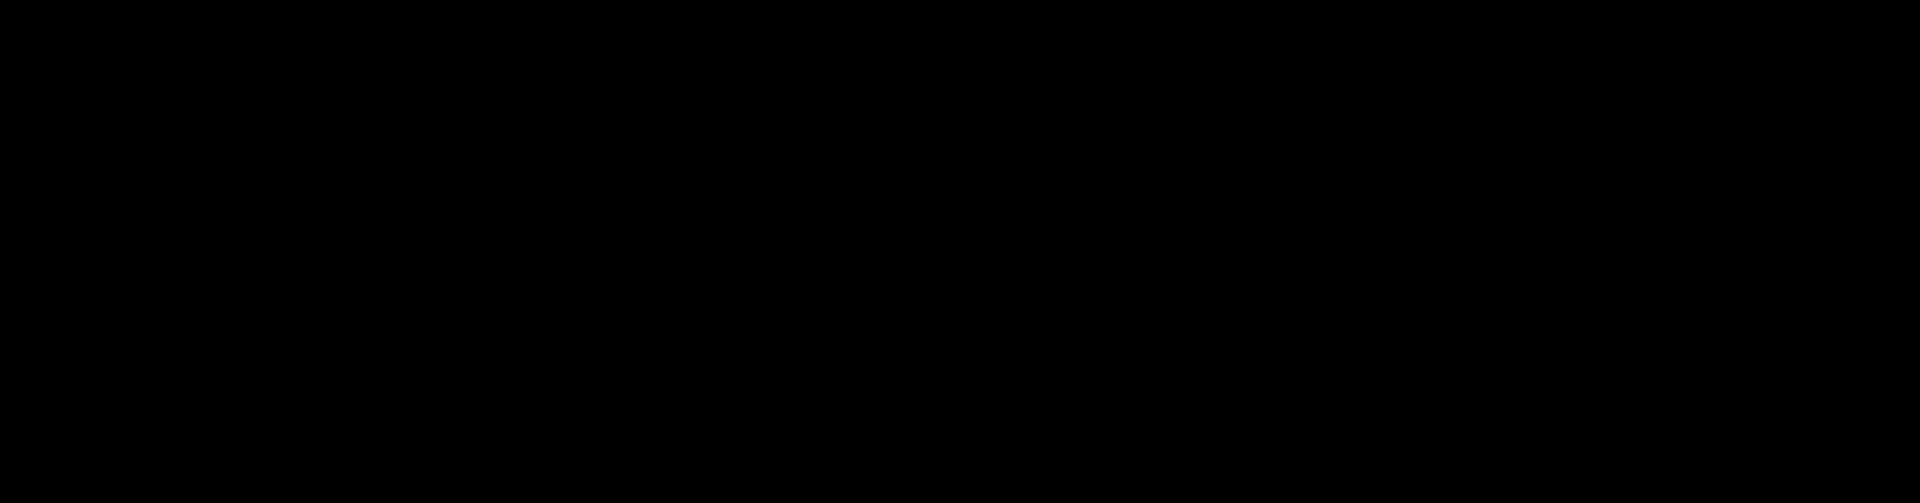 Rodenstock_logo_logotype